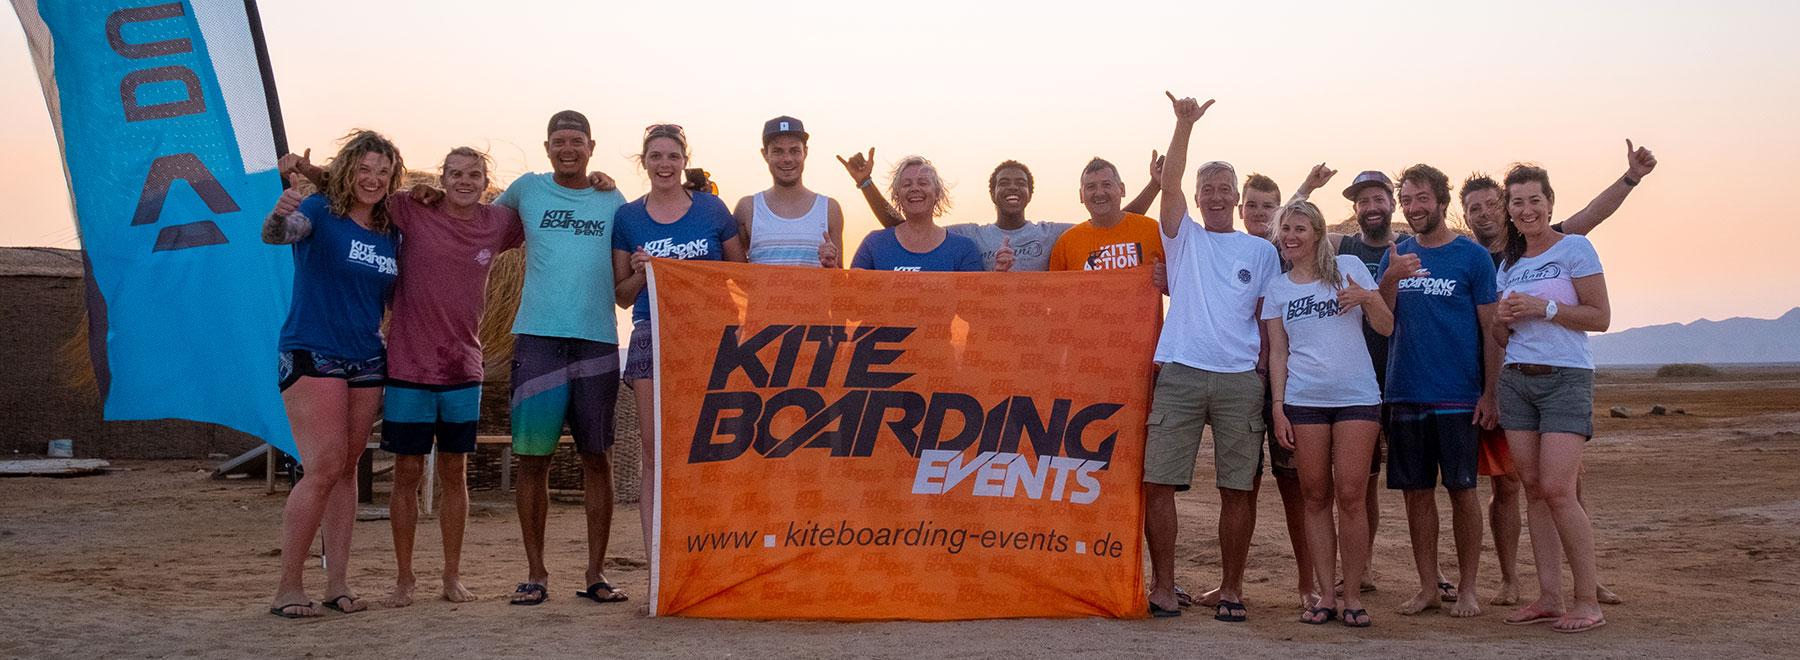 Kiteboarding-Events-El-Gouna-KiteWorldWide